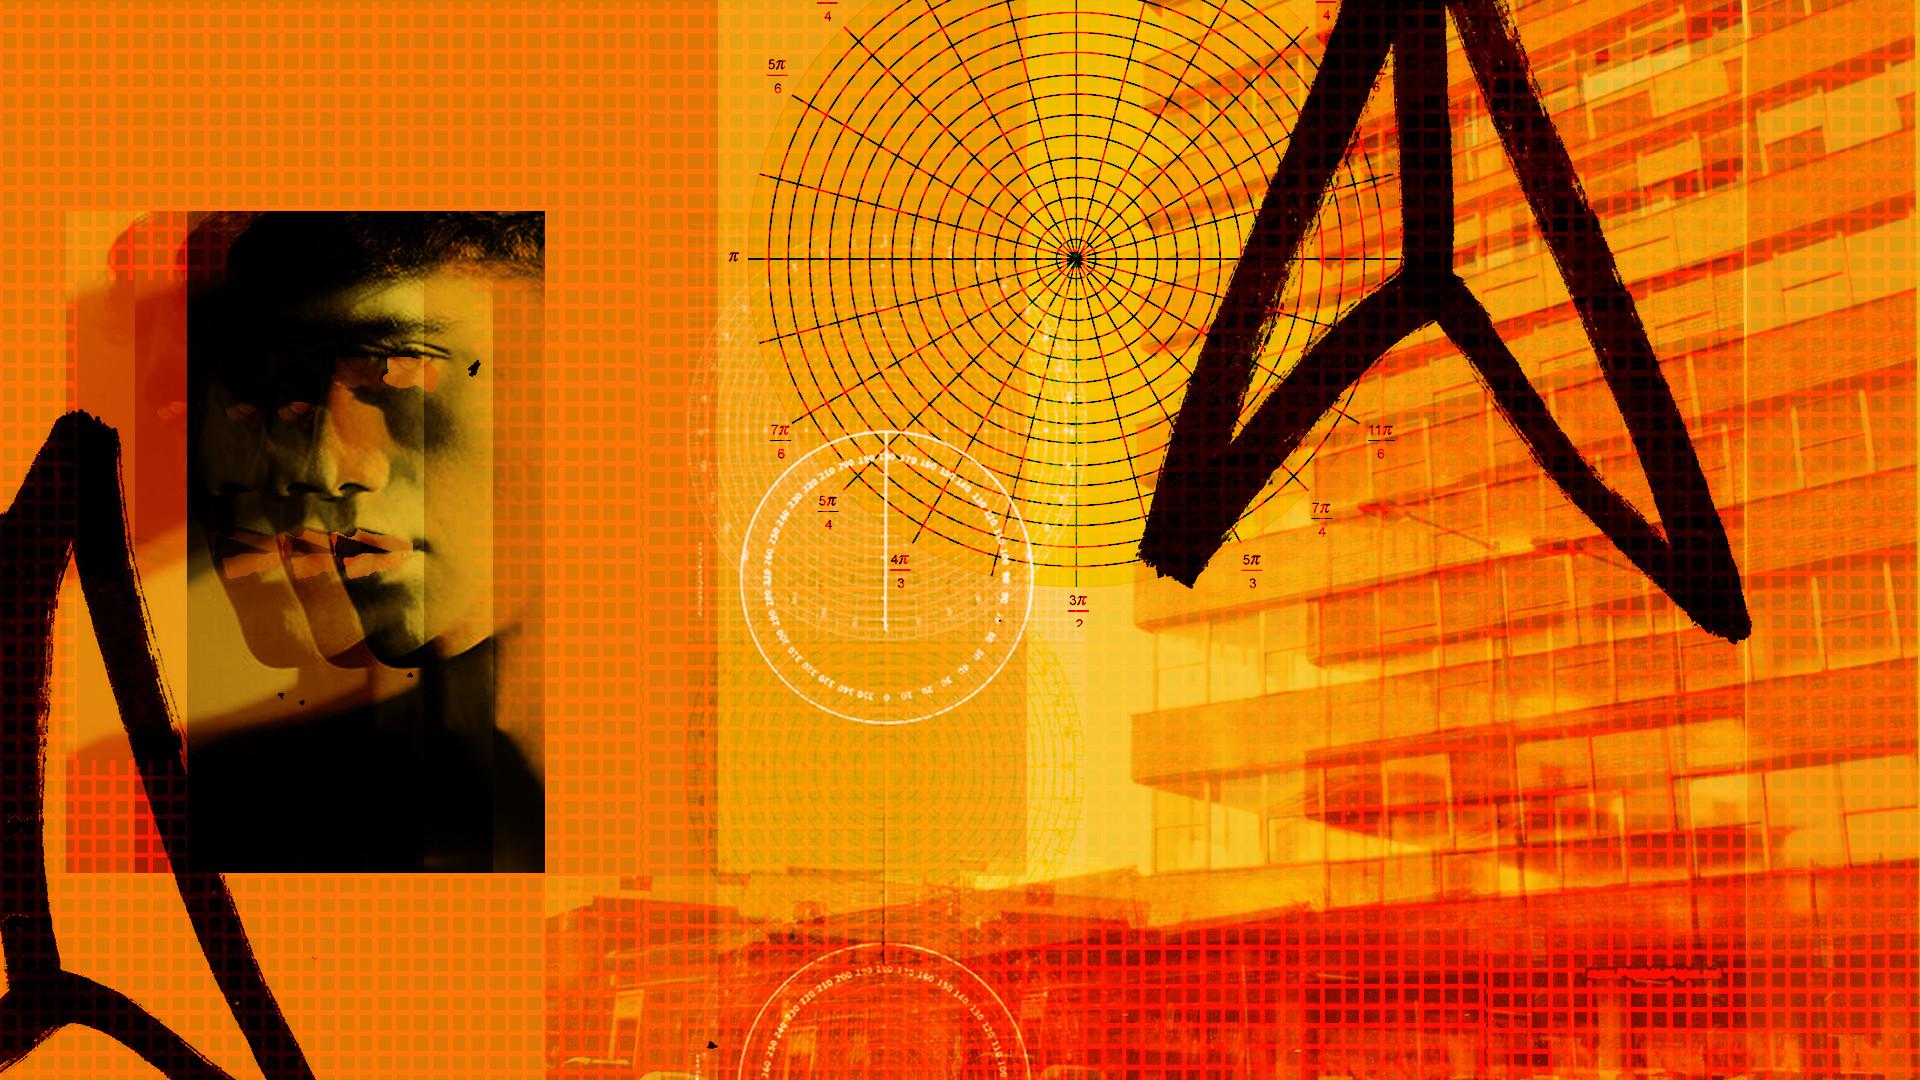 orange joby drop 7.jpg